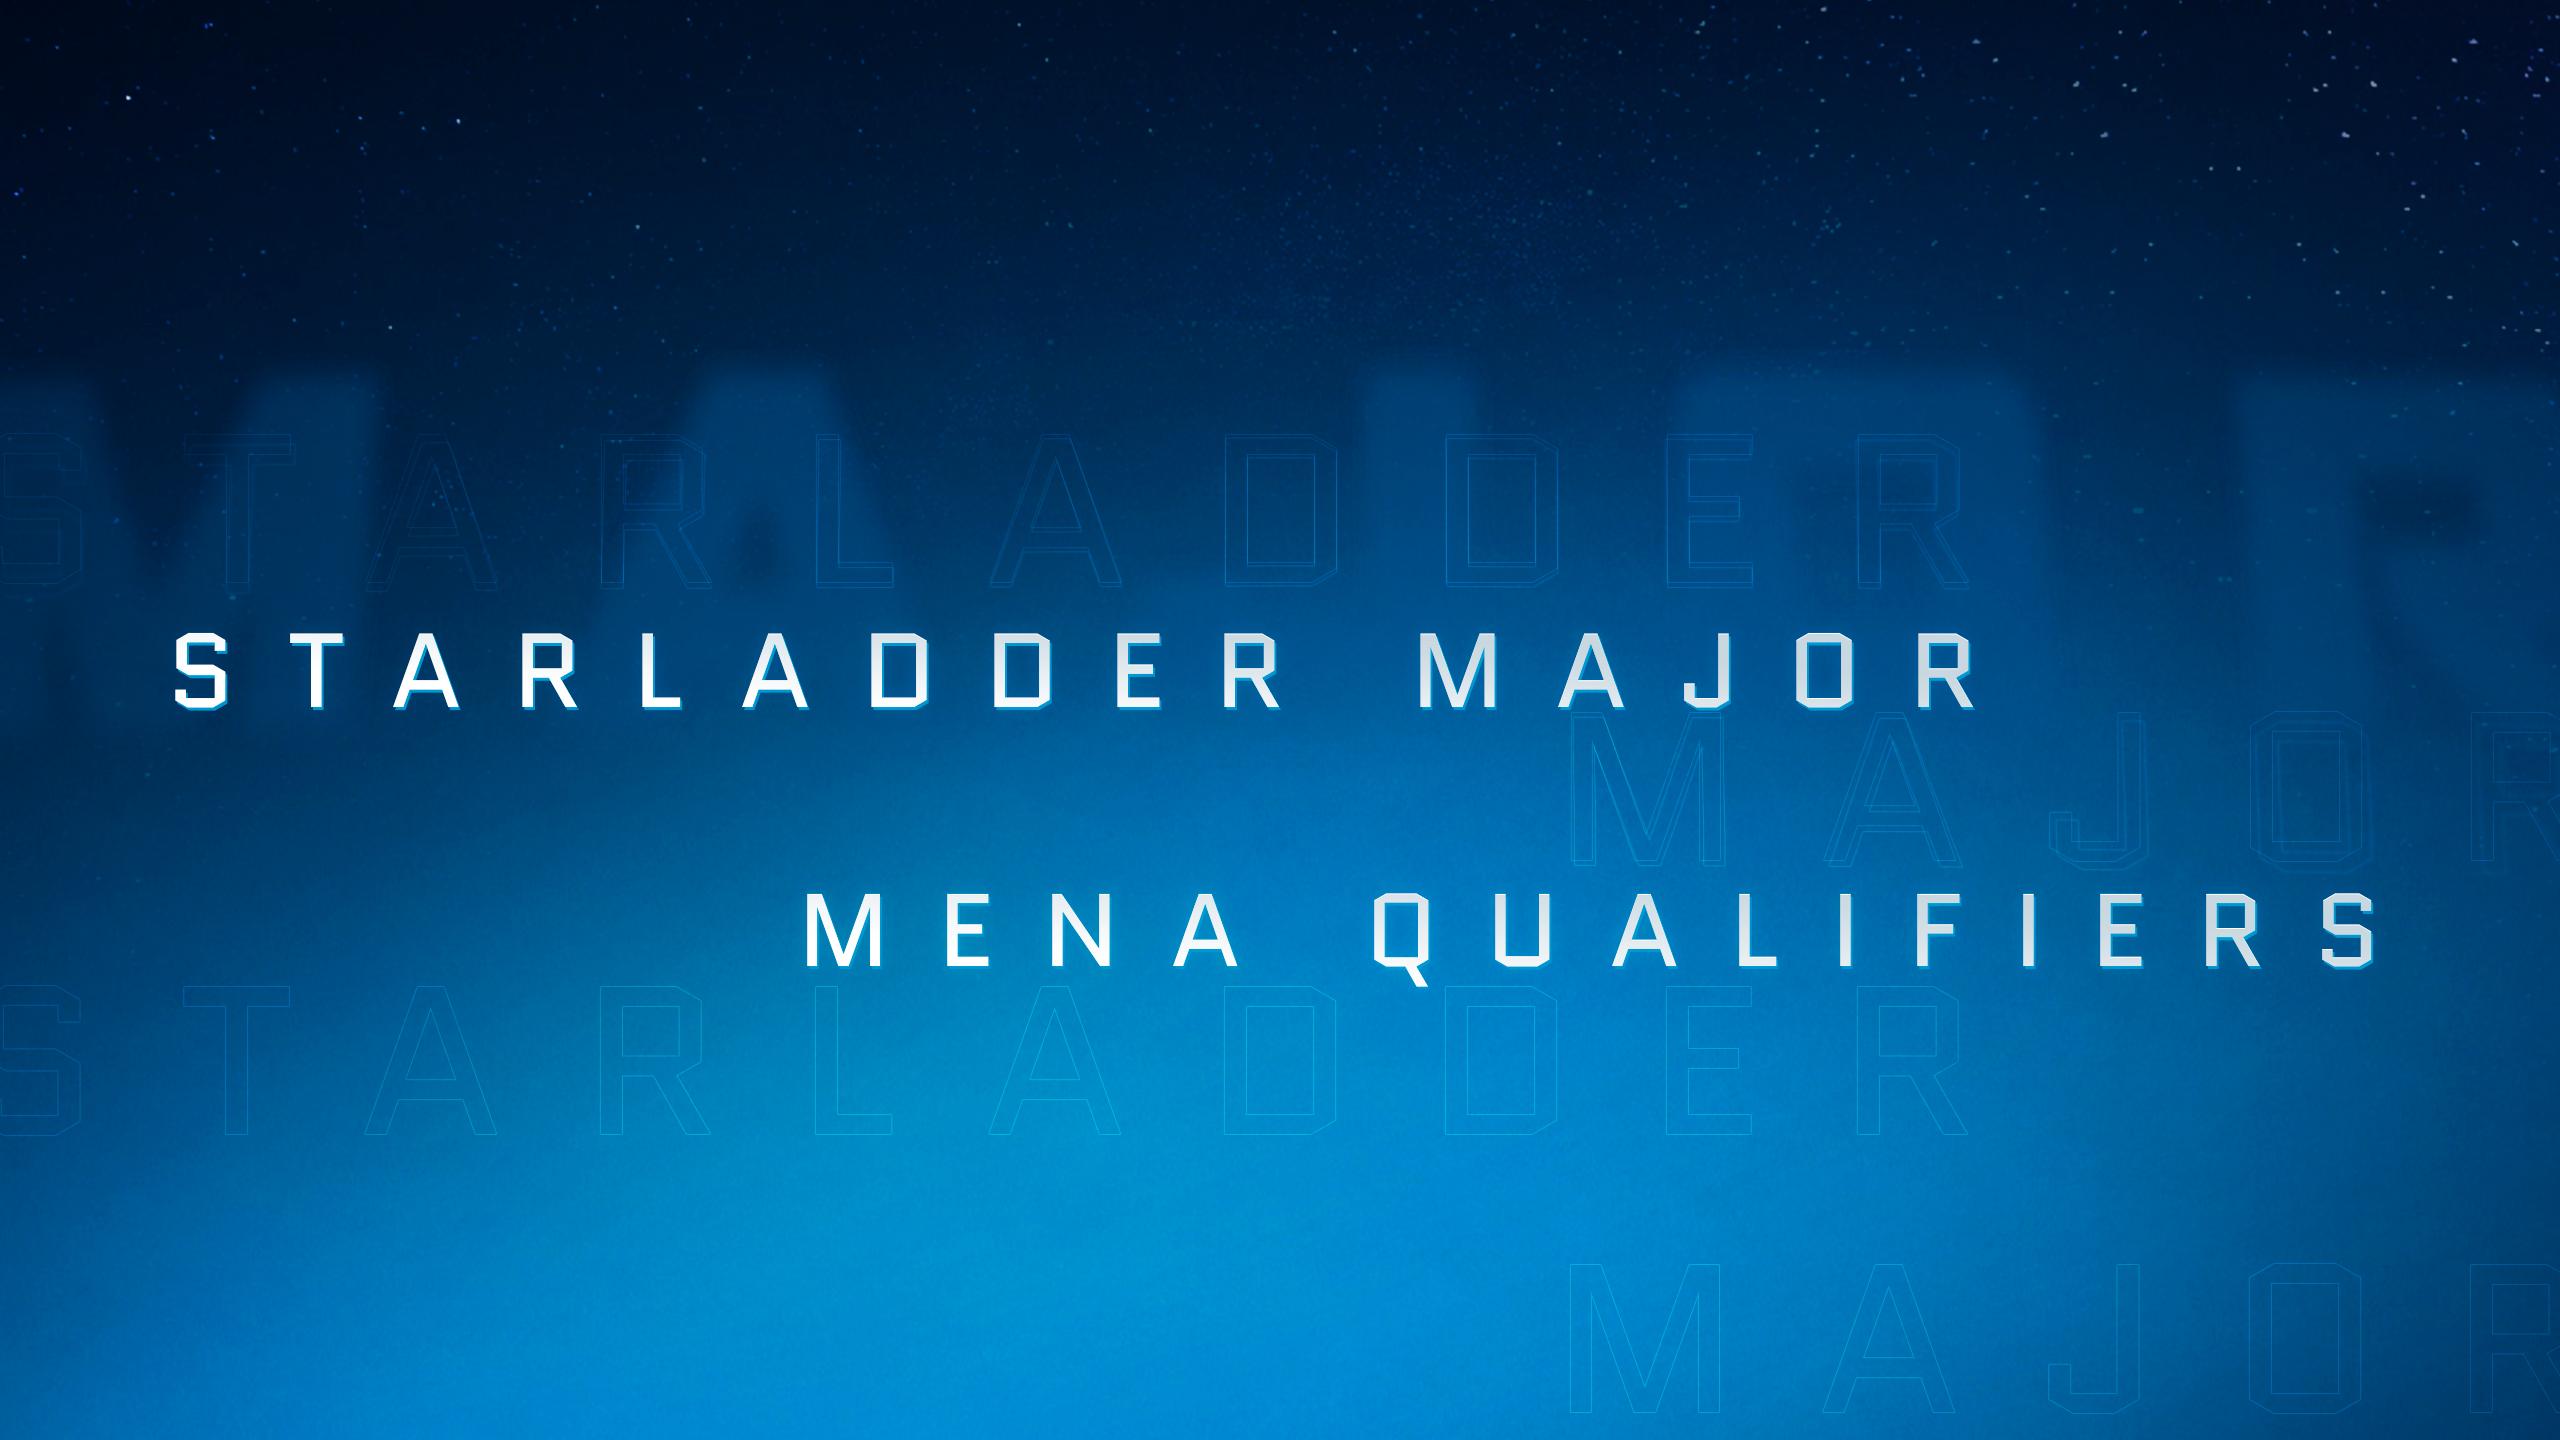 StarLadder Major: посев и расписание на закрытую квалификацию в регионе MENA